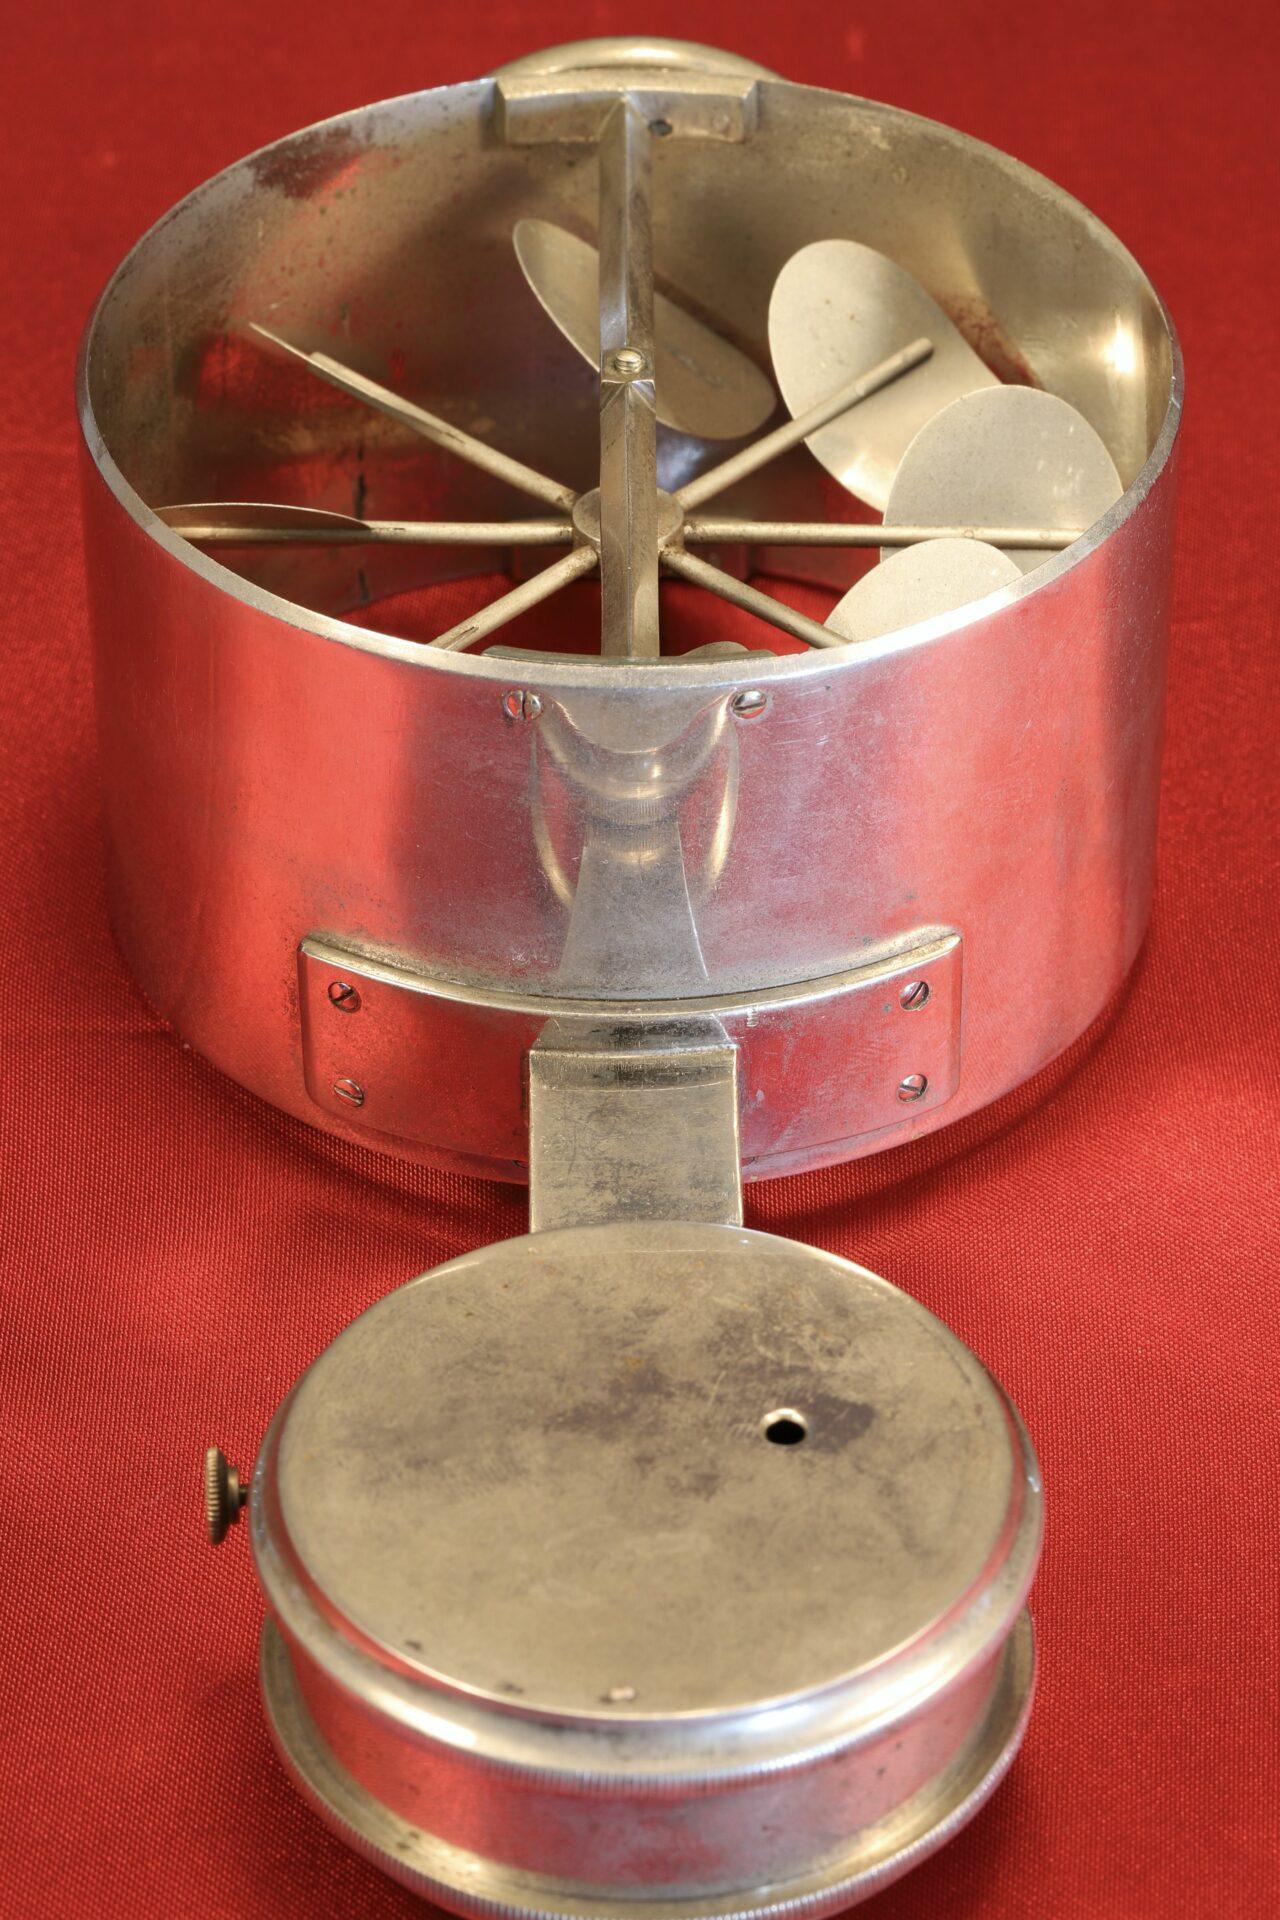 Image of back of Jules Richard Anemometer No 2316 c1890